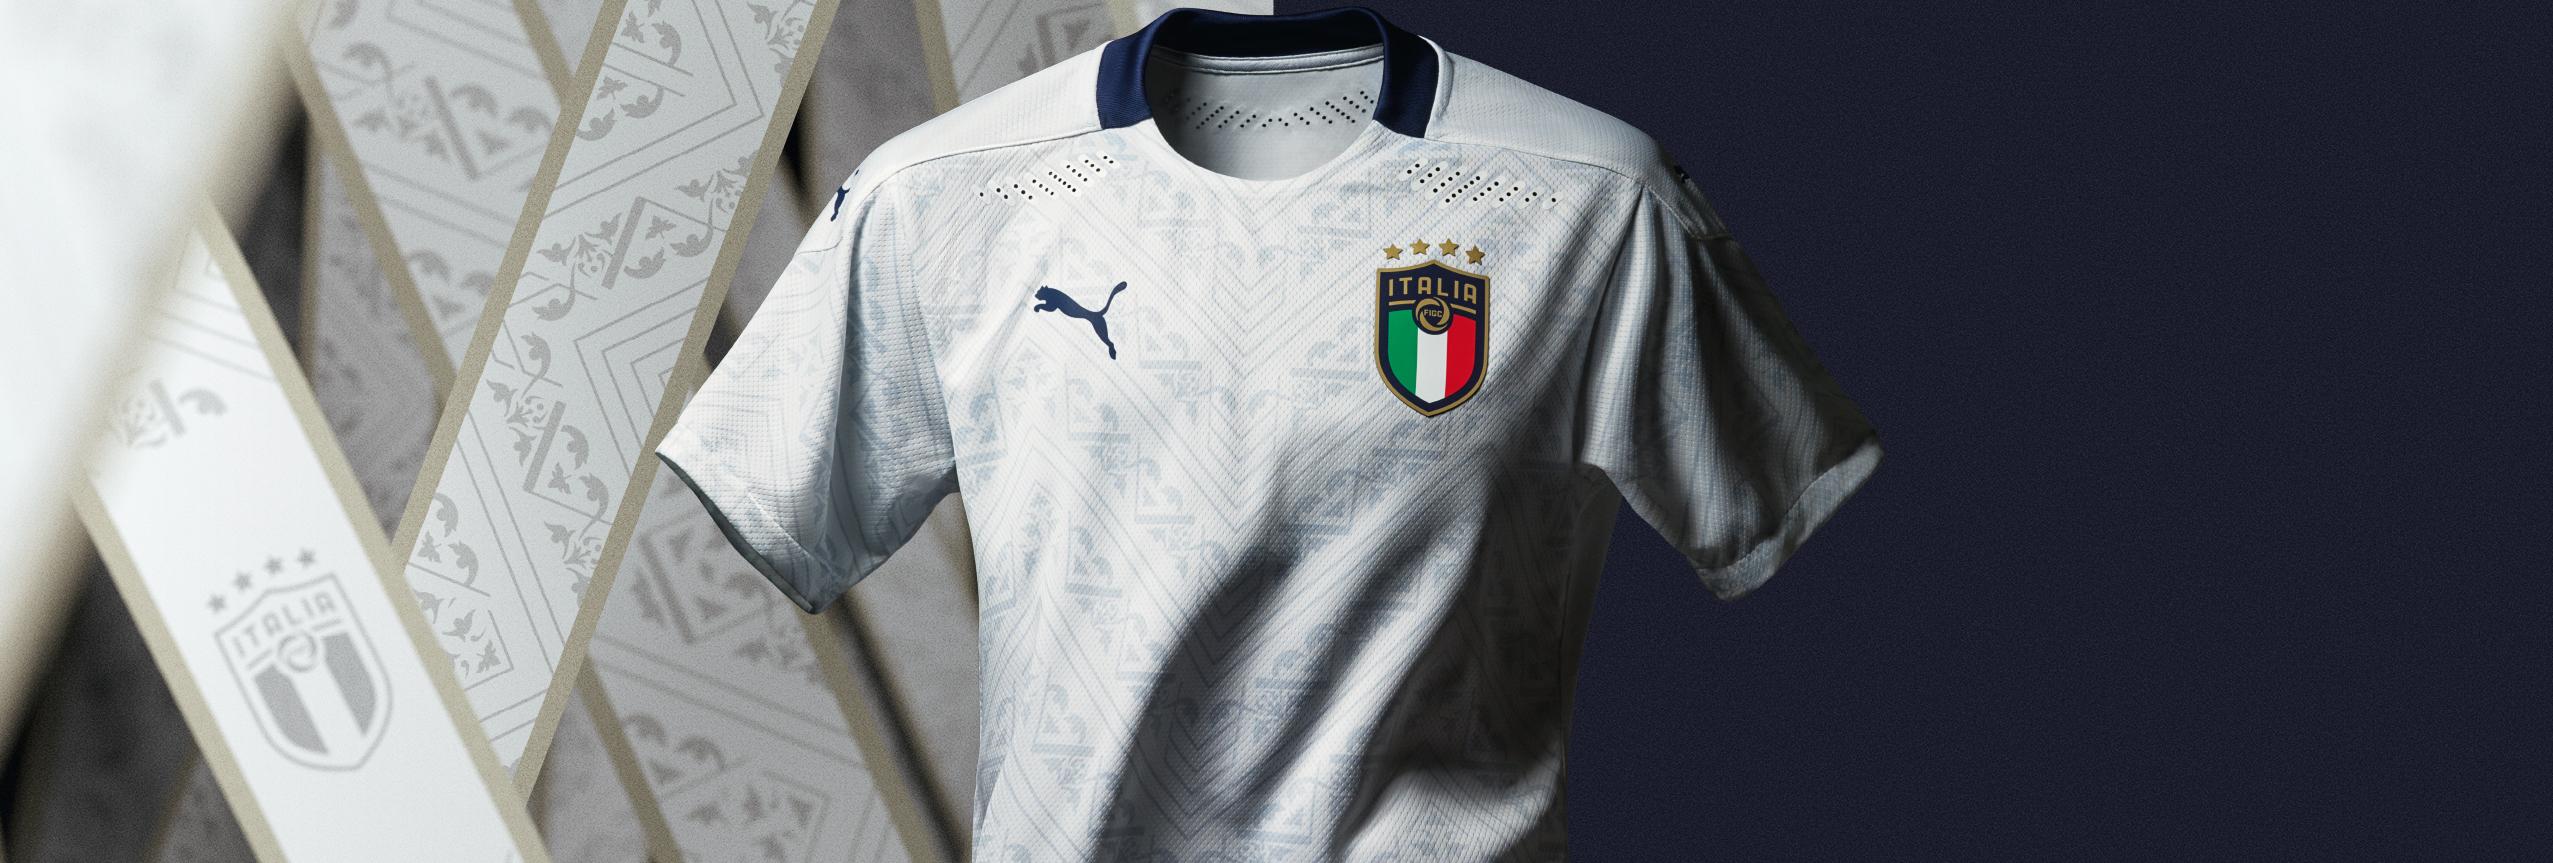 20SS_PR_TS_Football_National-Team_Away-Shirt_2561x1536px_Italy copy.jpg